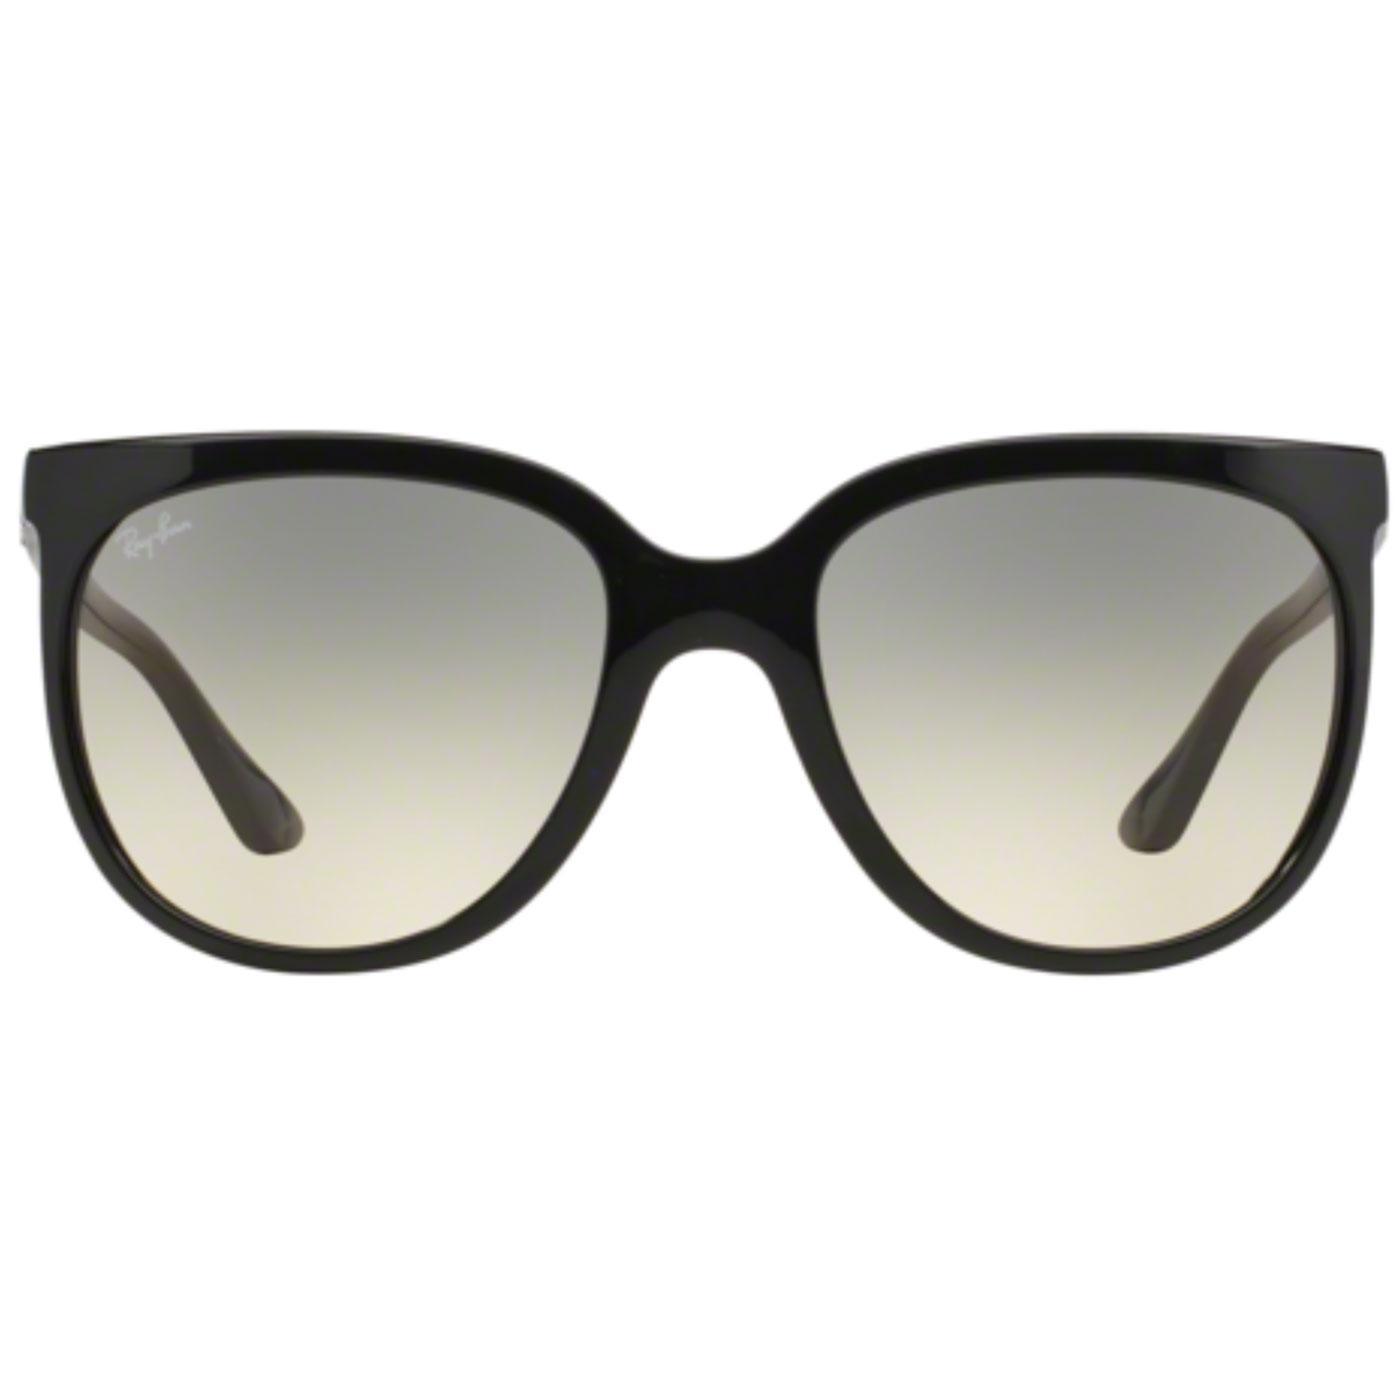 Cats 1000 RAY-BAN Retro 70s Wayfarer Sunglasses Bl